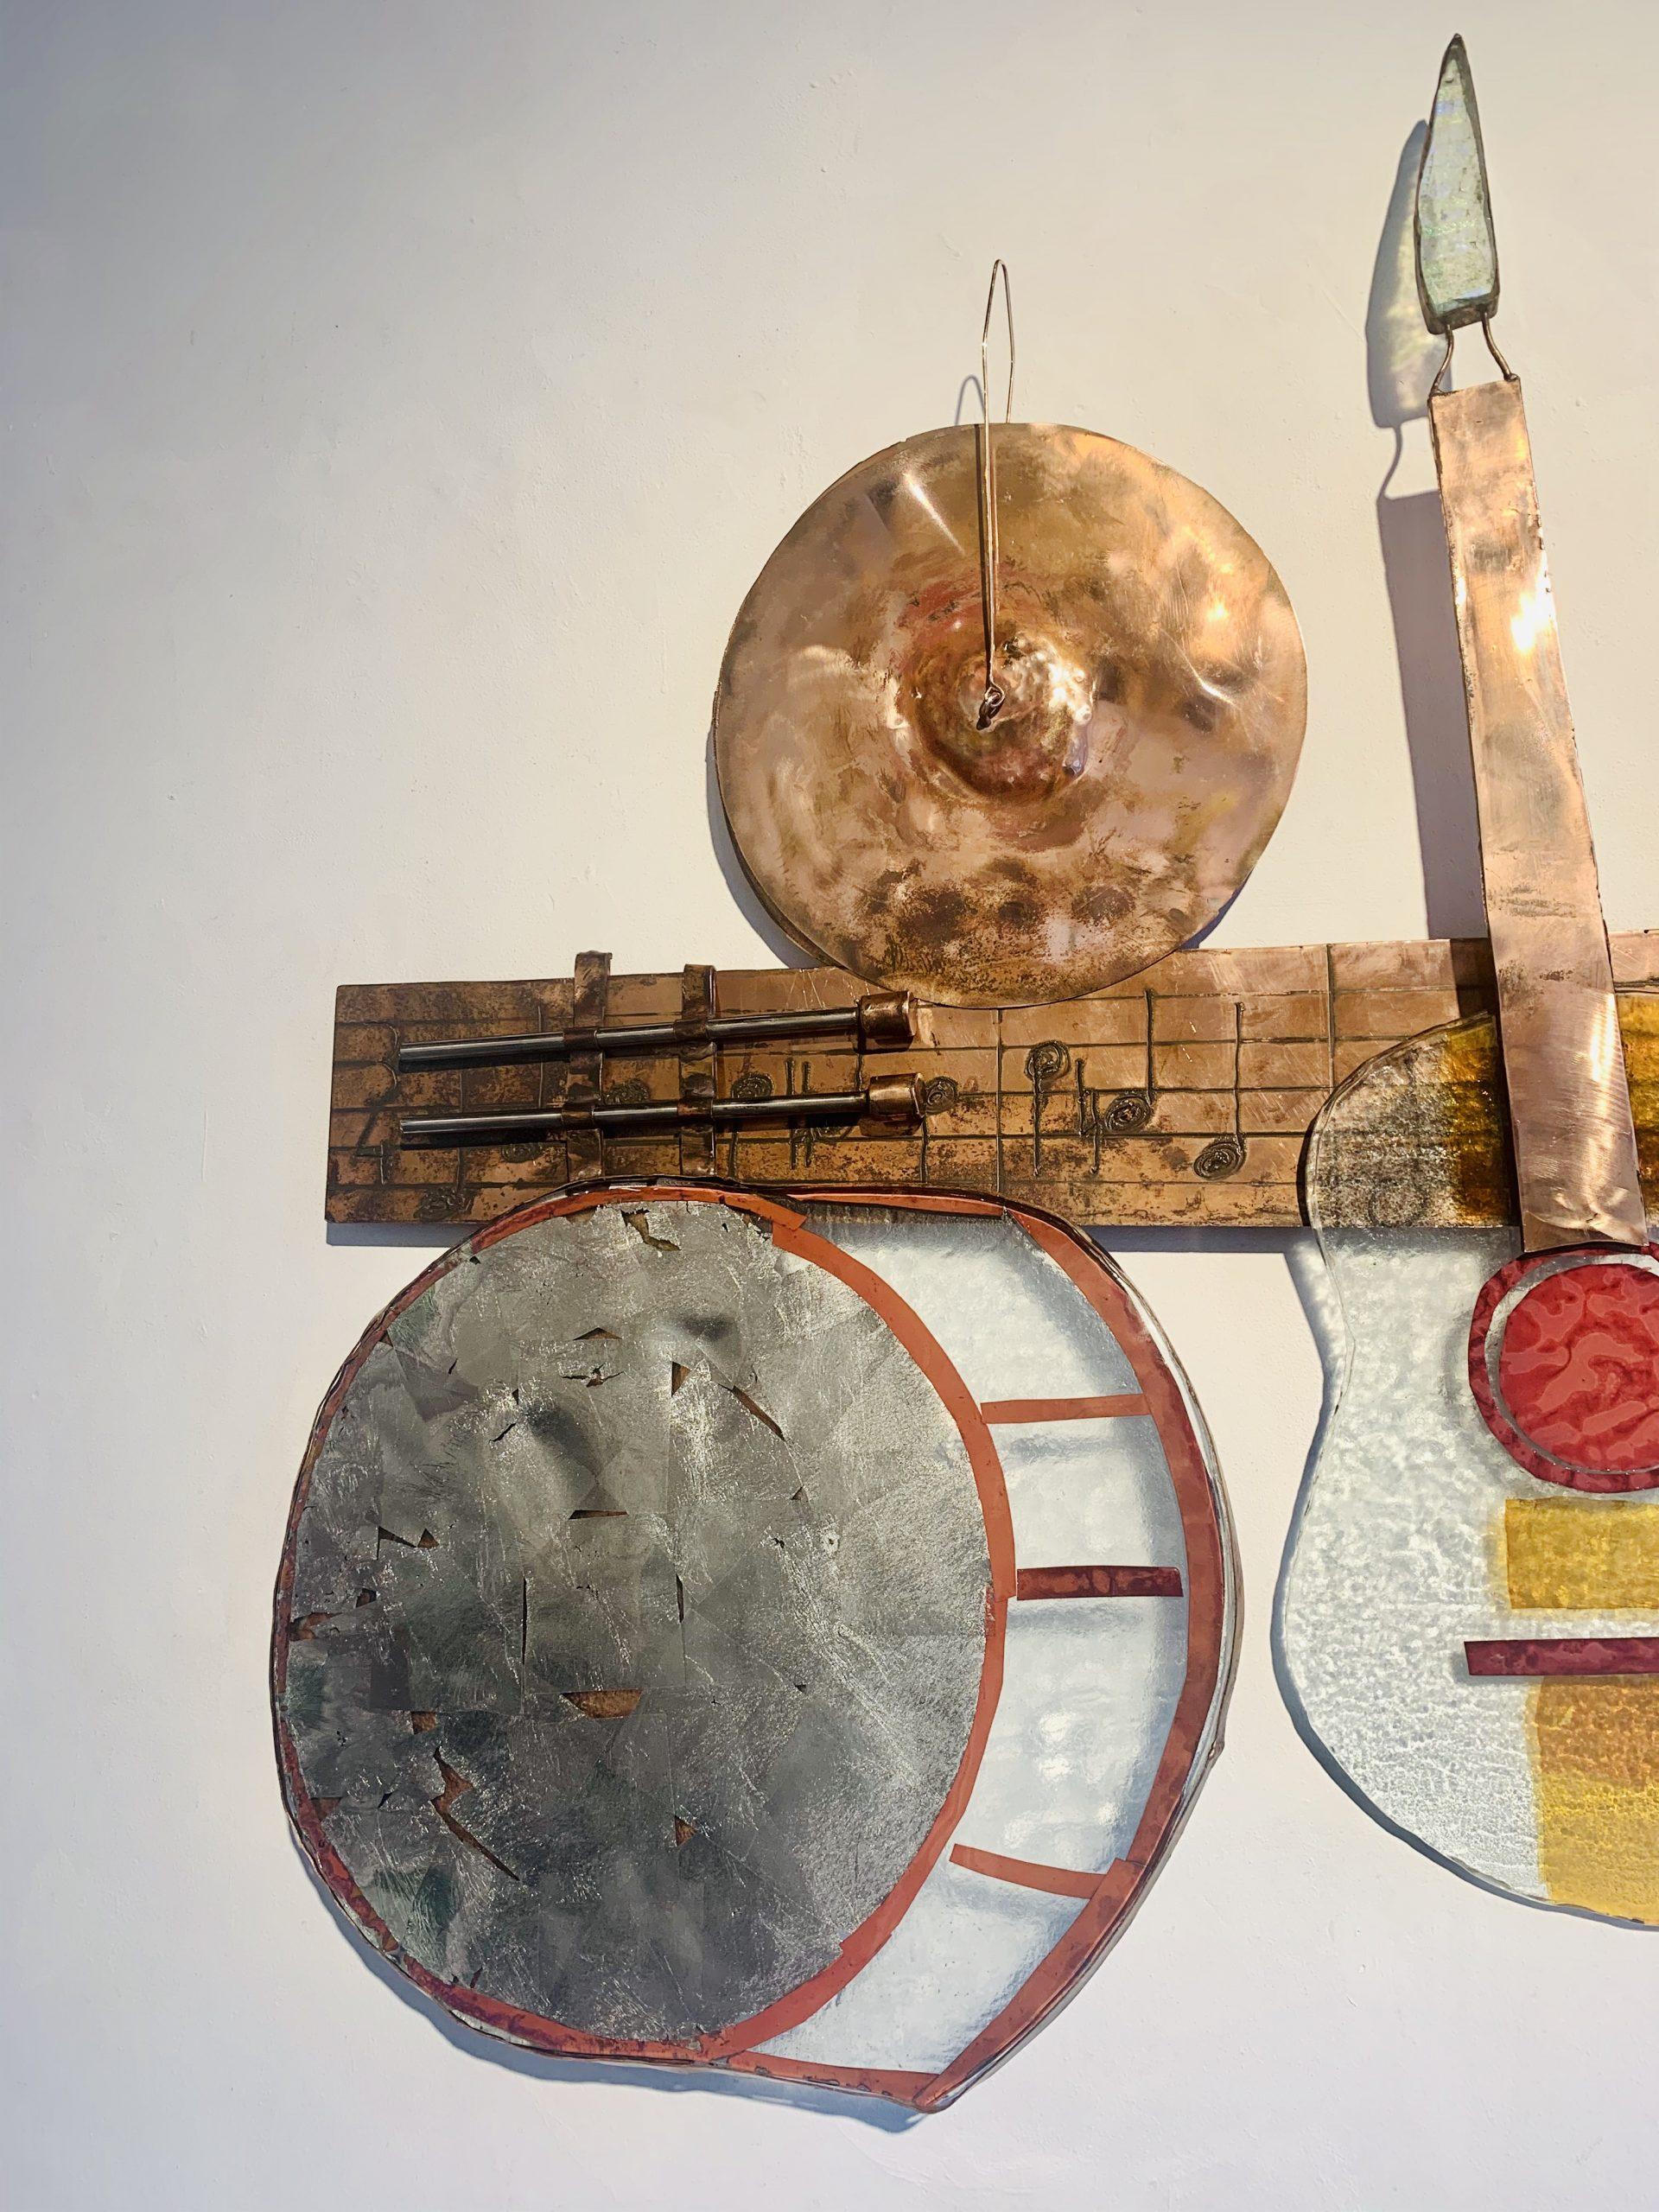 Wandobject muziekinstrumenten klant Funs Uiting SJAAK SMETSERS3